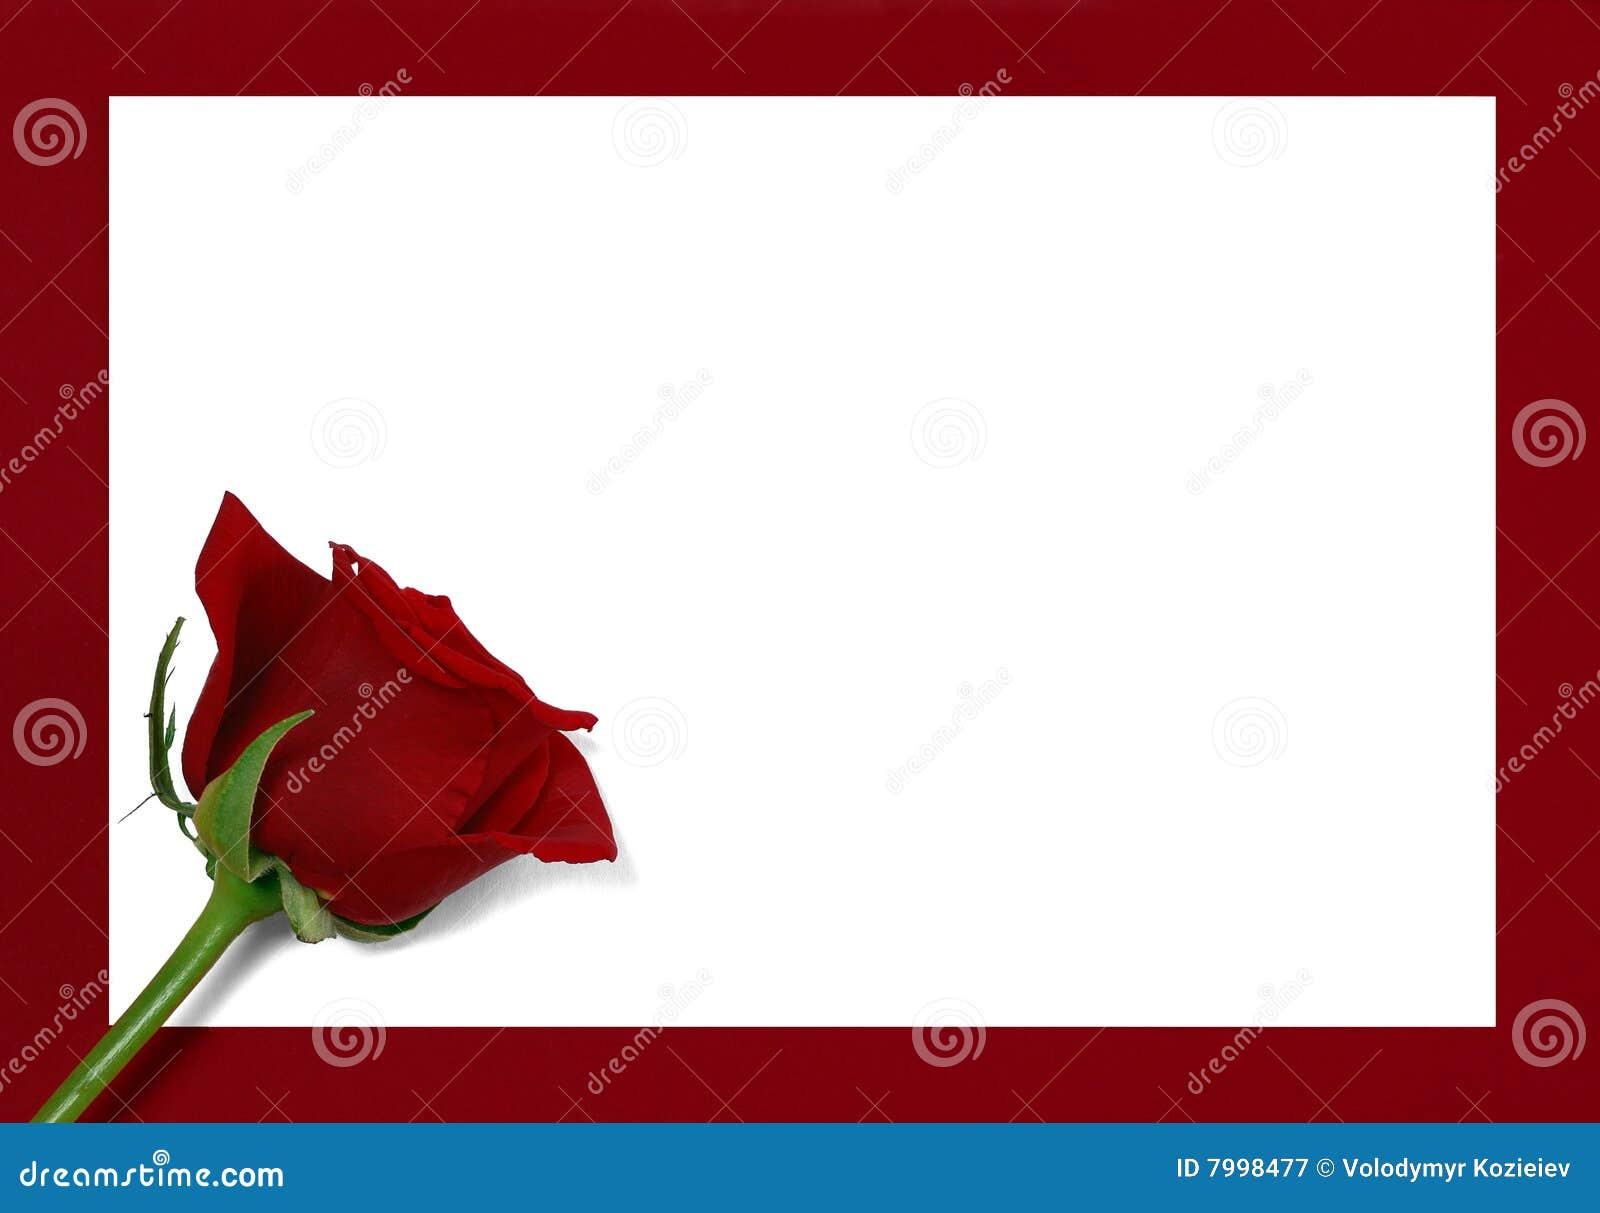 Rose bud on paper